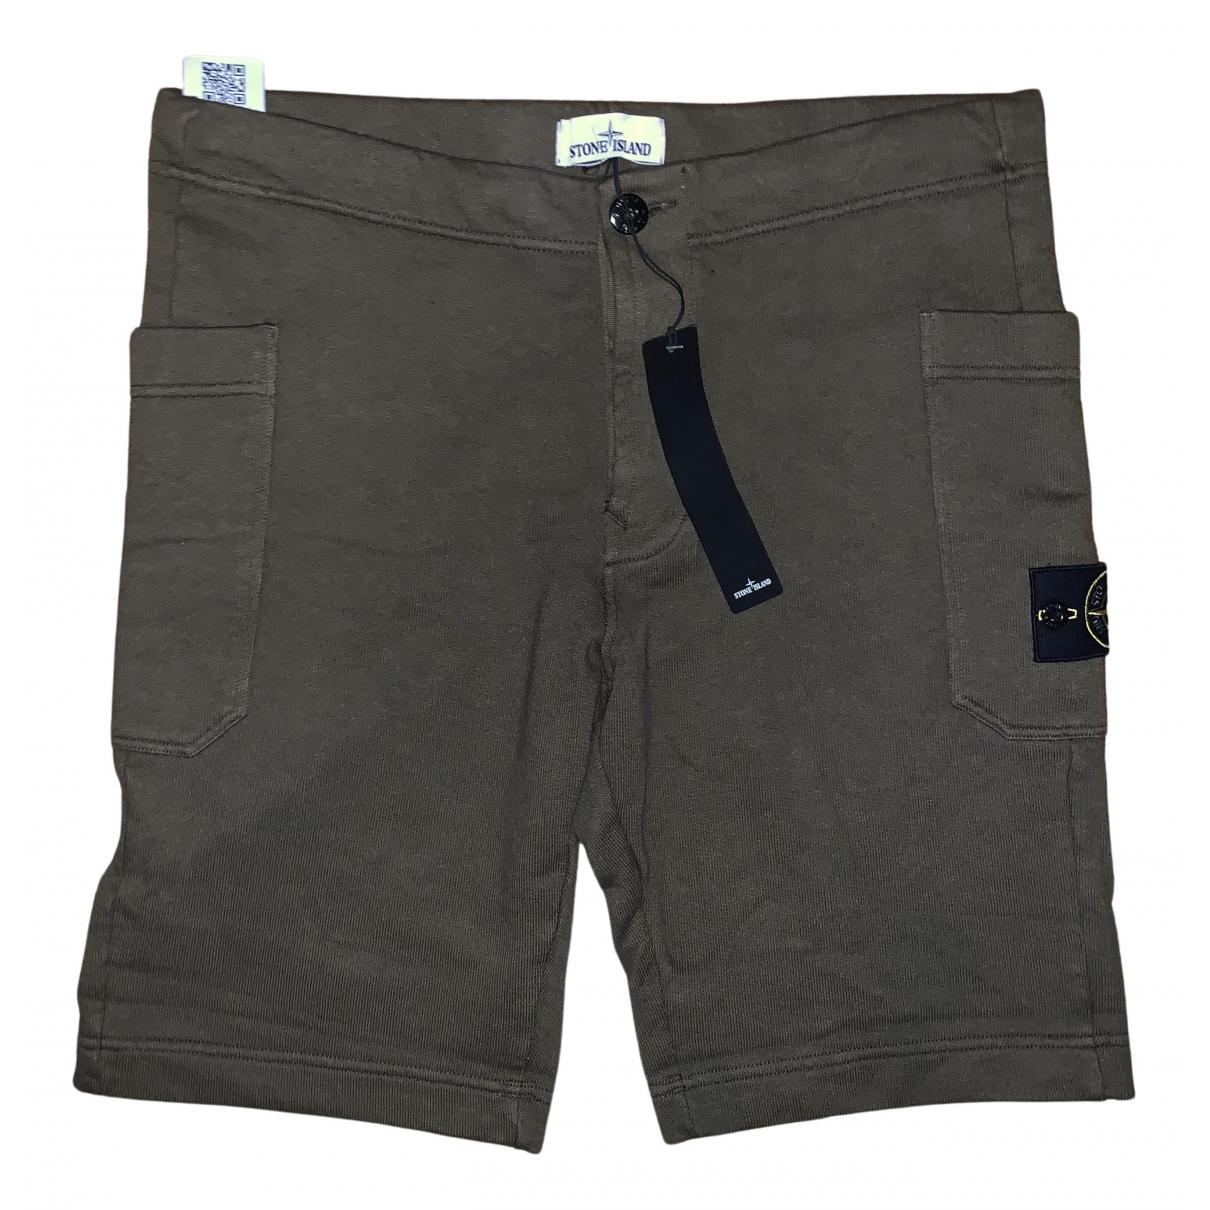 Stone Island \N Shorts in  Gruen Baumwolle